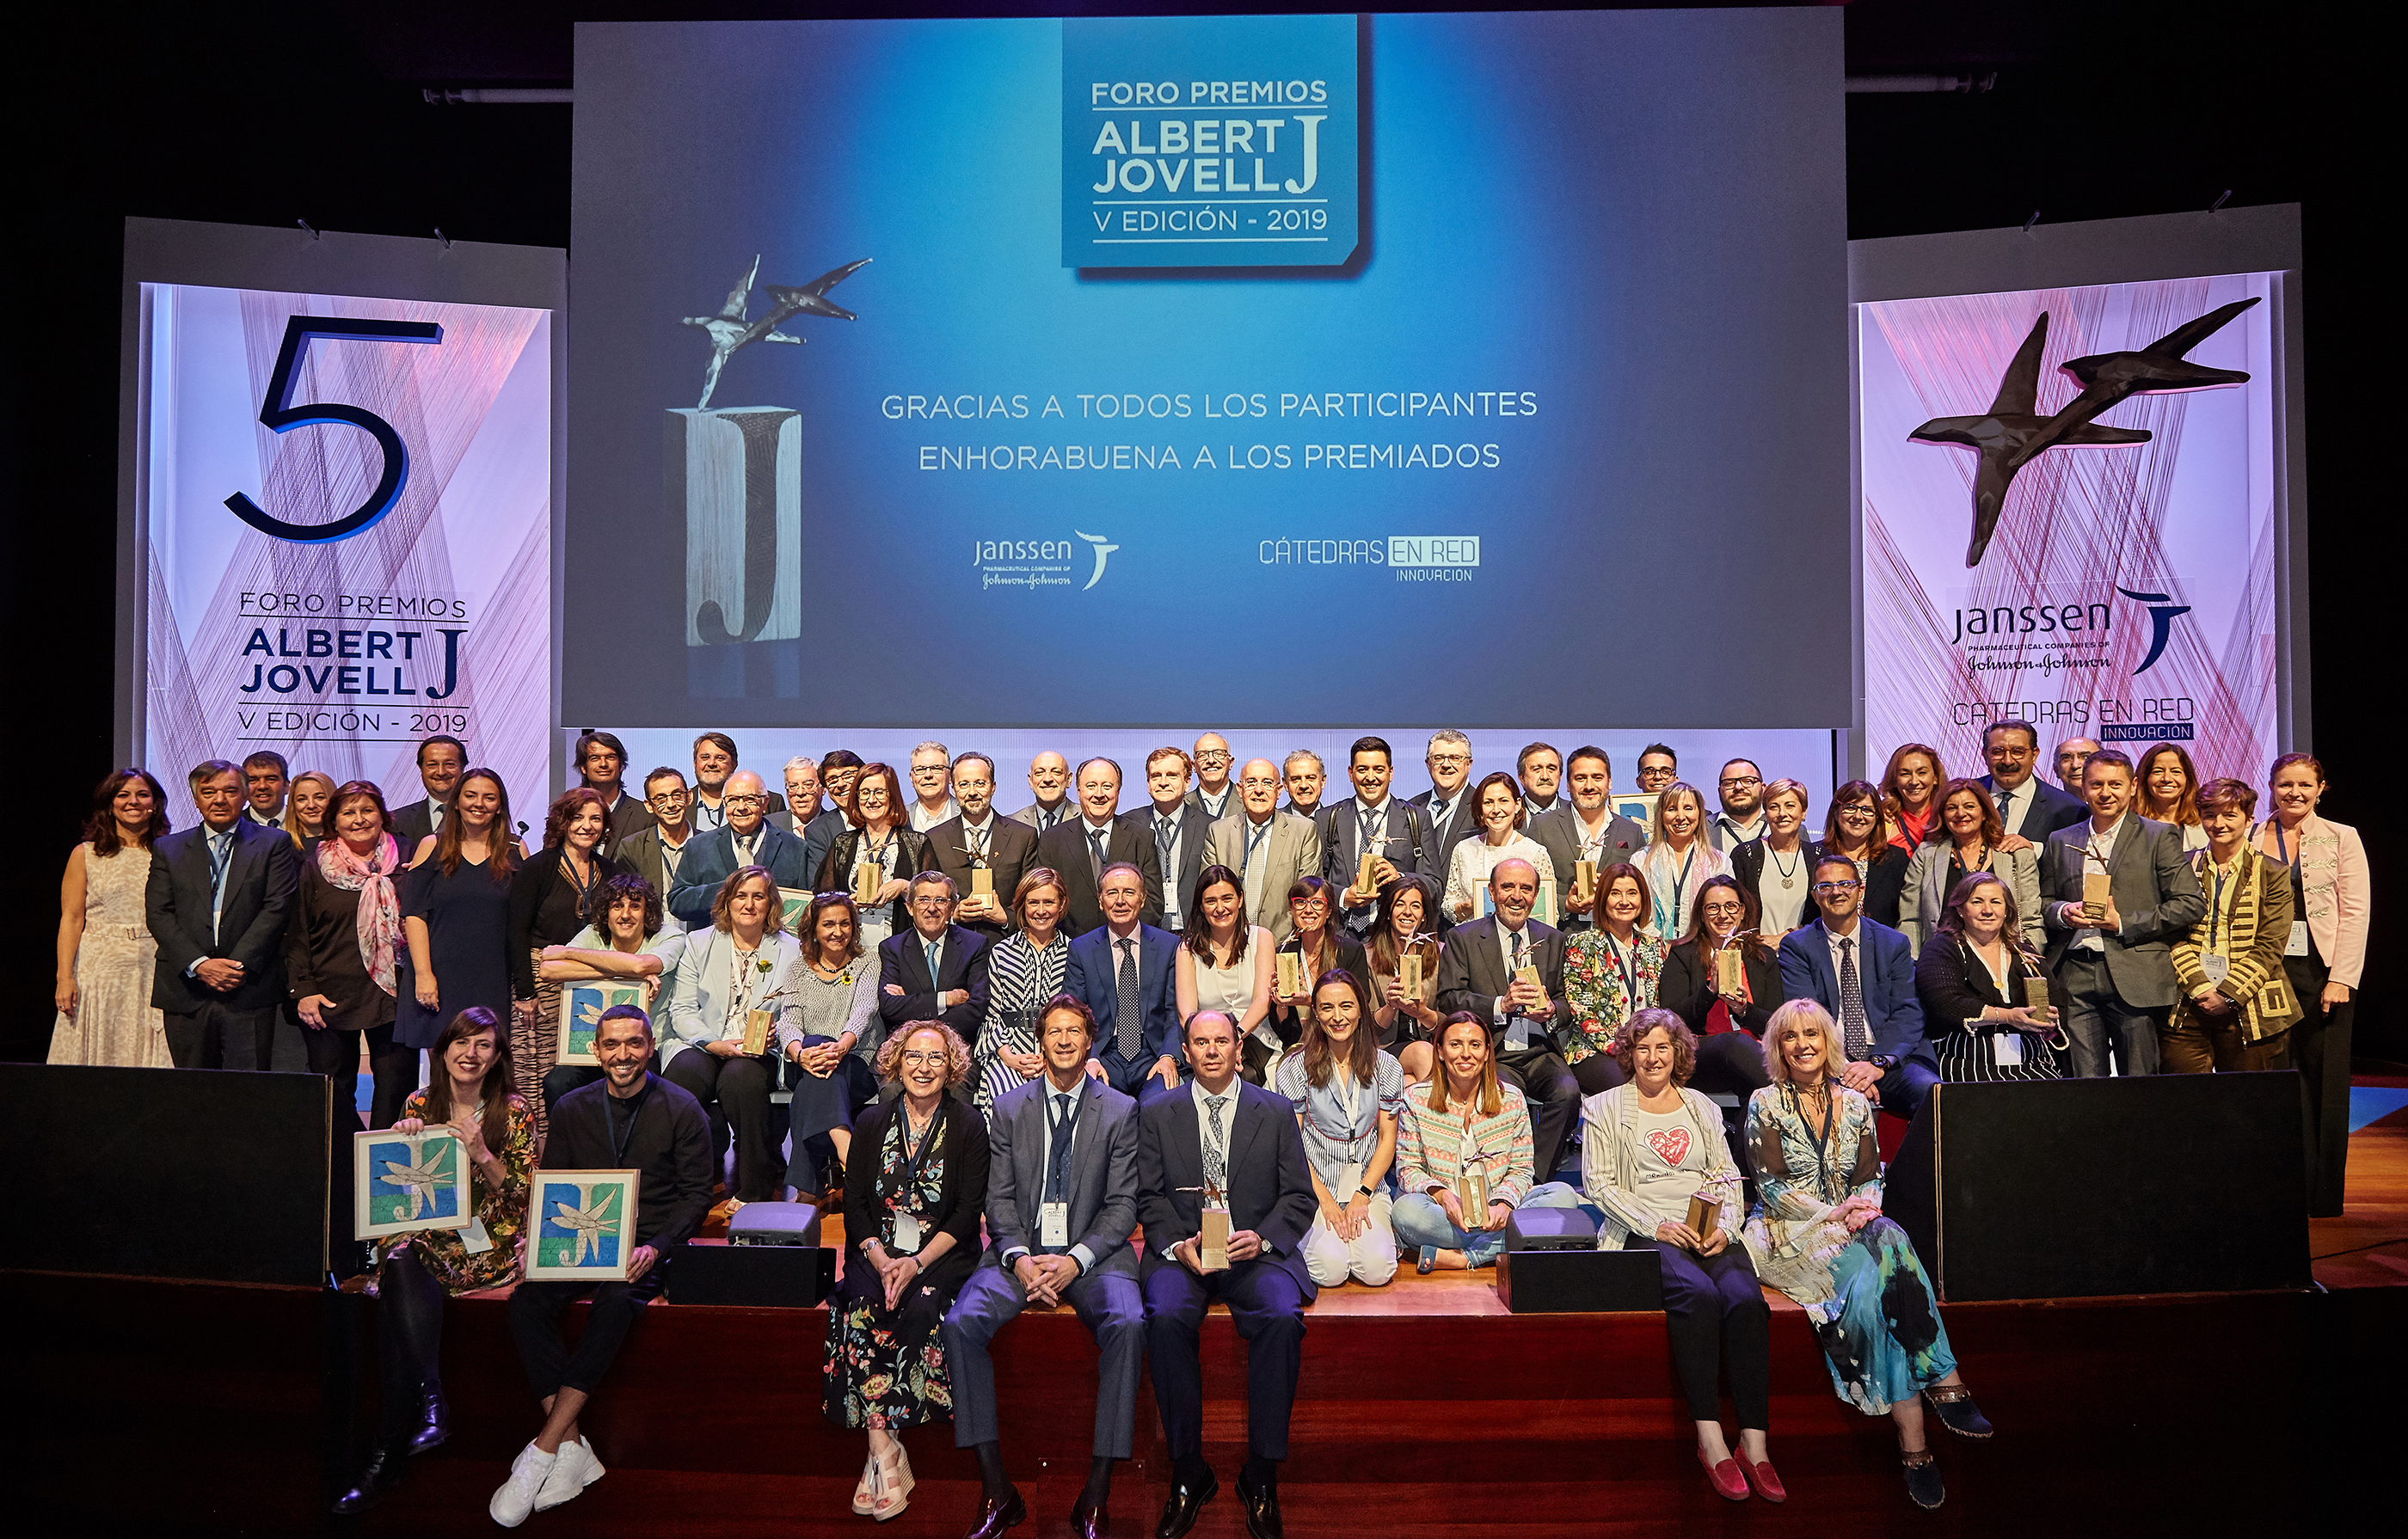 Albert Jovell Awards